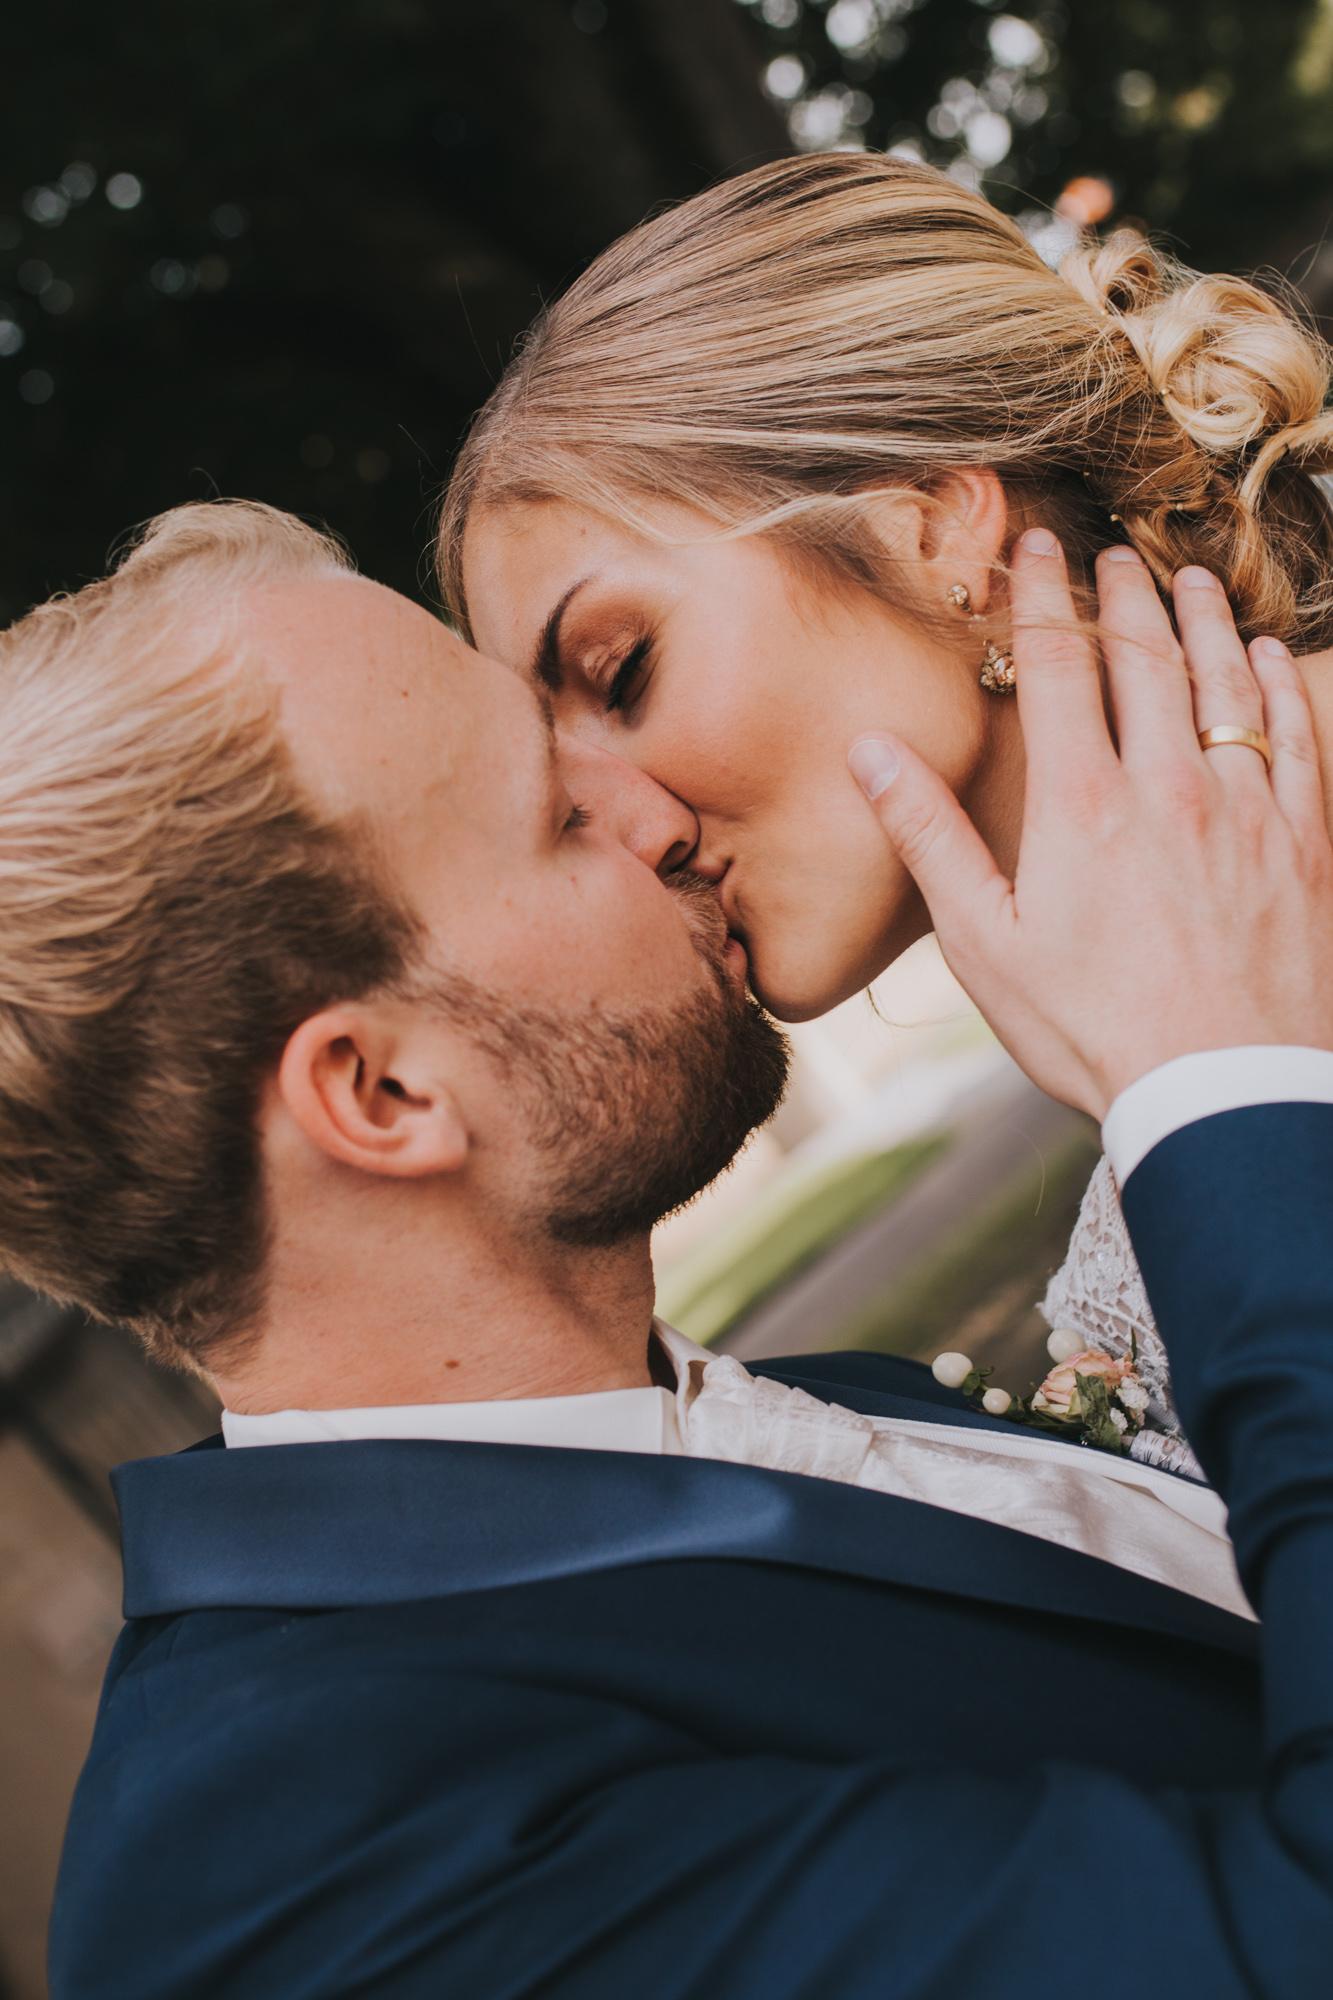 Hochzeit - Memory factory - 20180616-0043.jpg